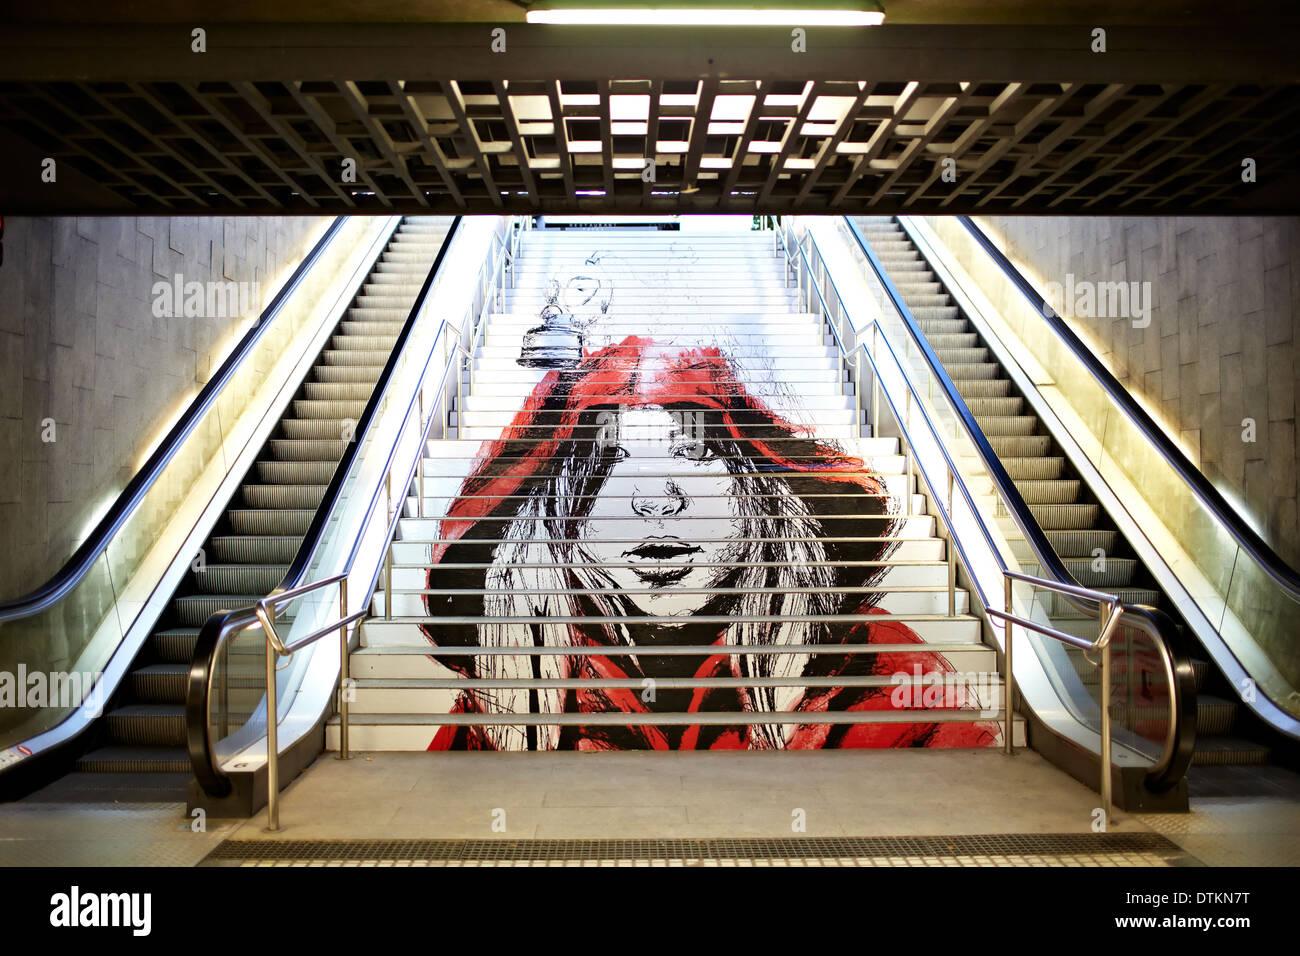 Graffiti in metropolitana. Immagini Stock